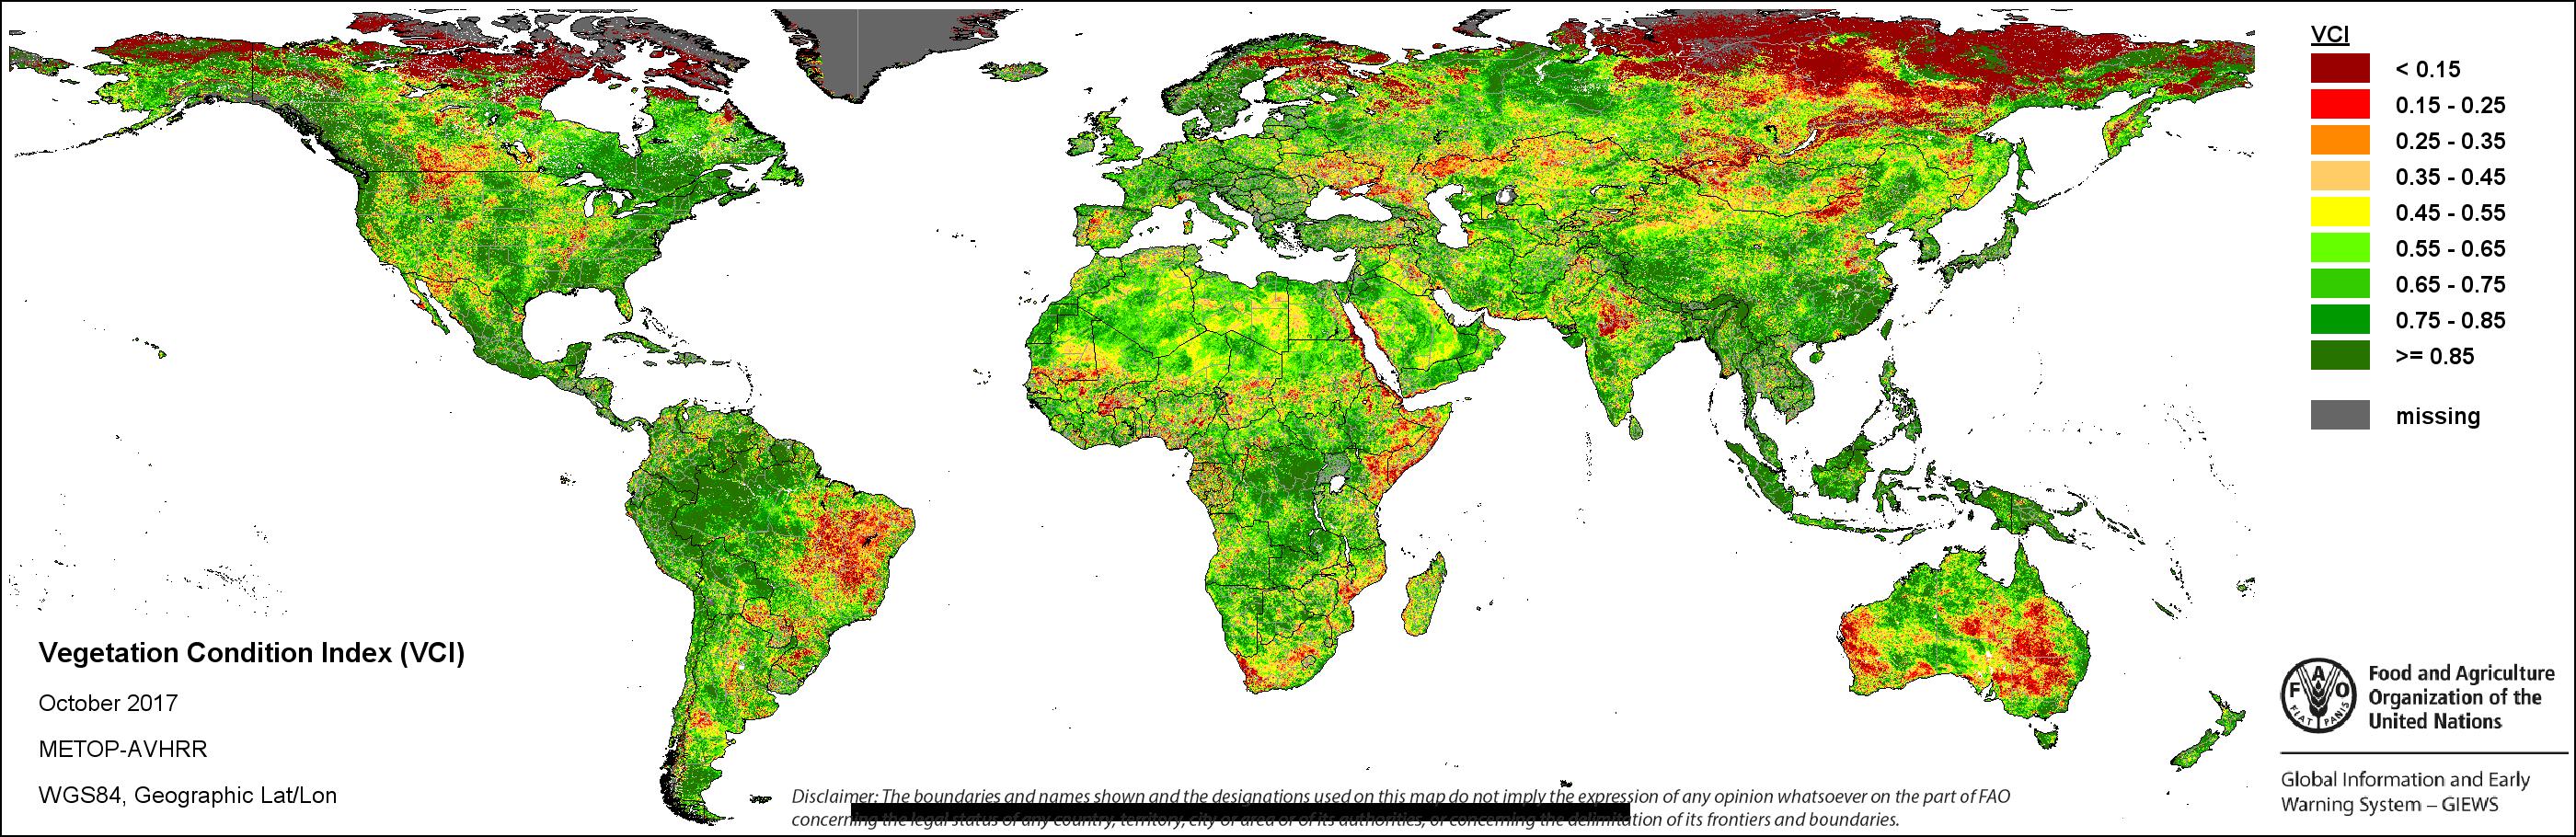 FAOGIEWS Earth ObservationSeasonal Global IndicatorsMETOP - Norway vegetation map